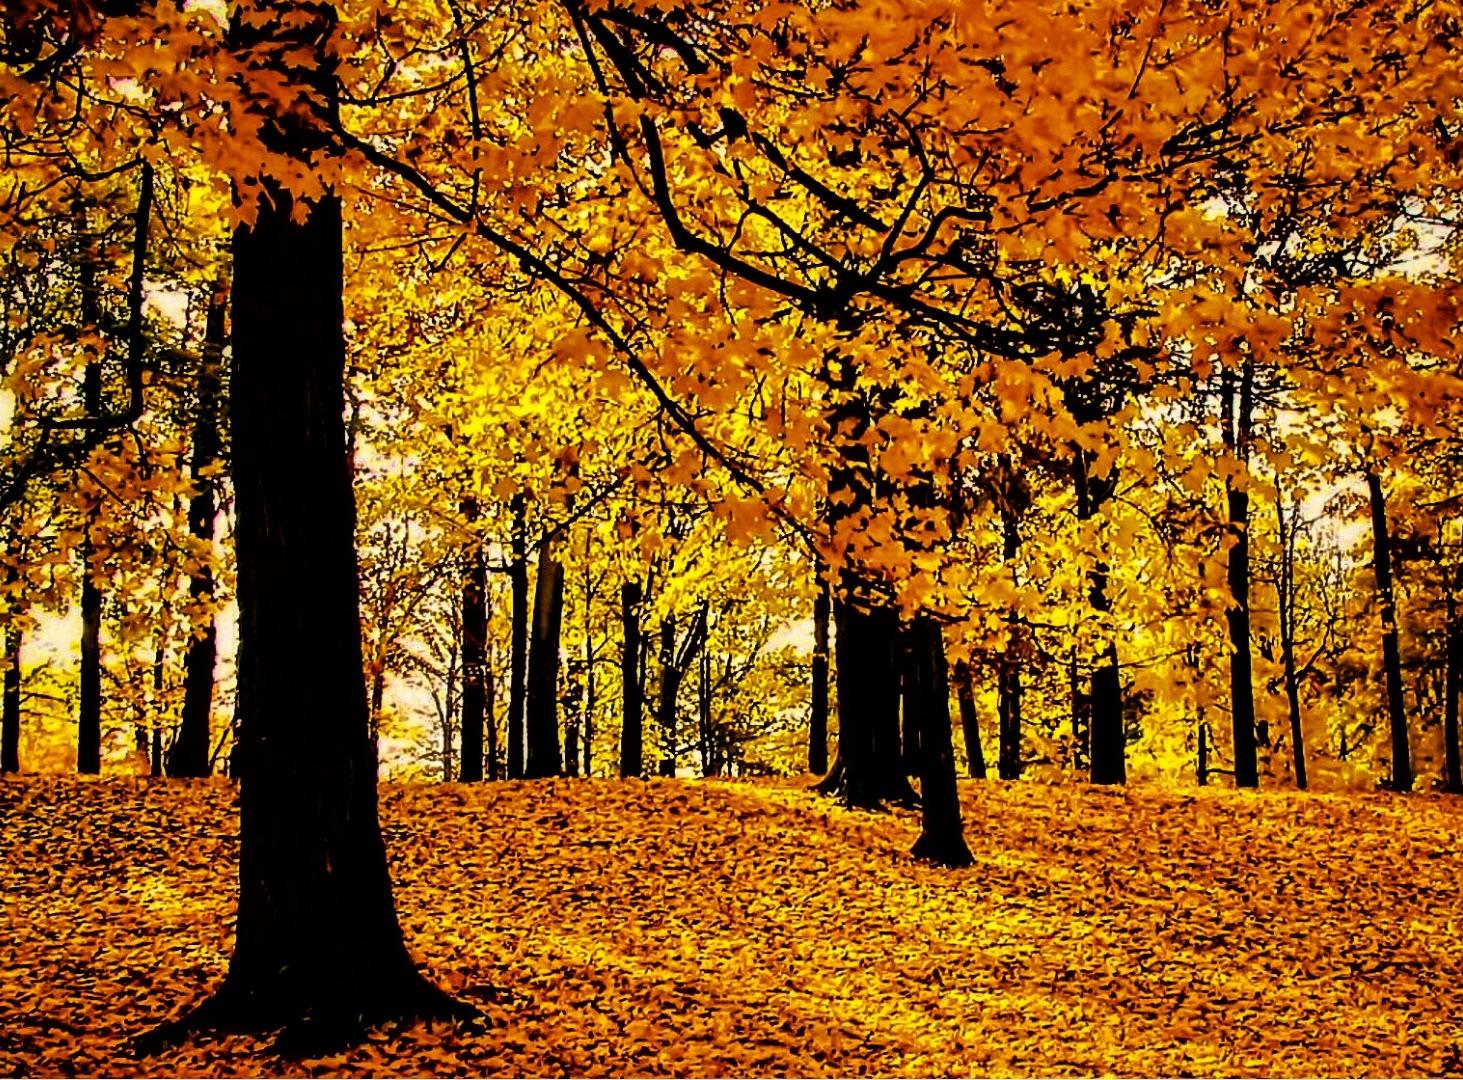 Beech Forest by Gregorio Emper